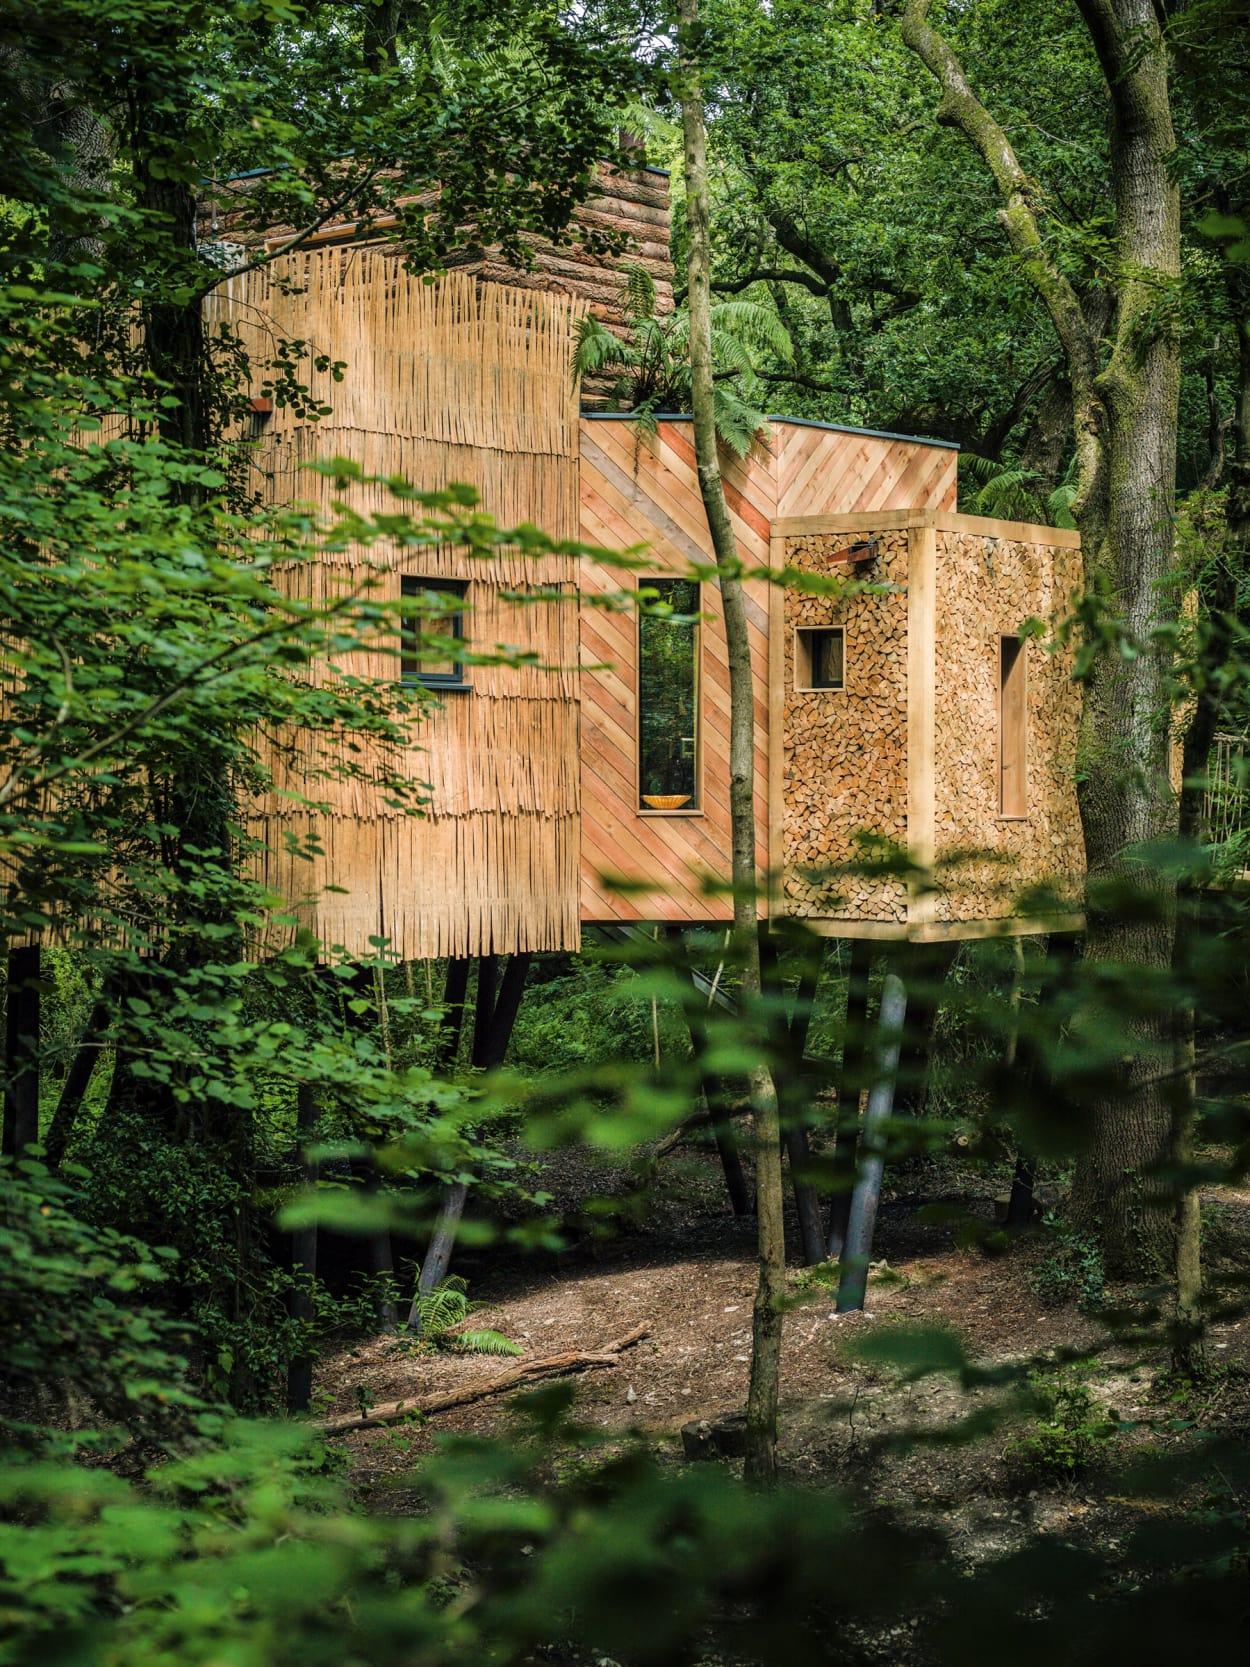 Dorset Baumhaus, Treehouse